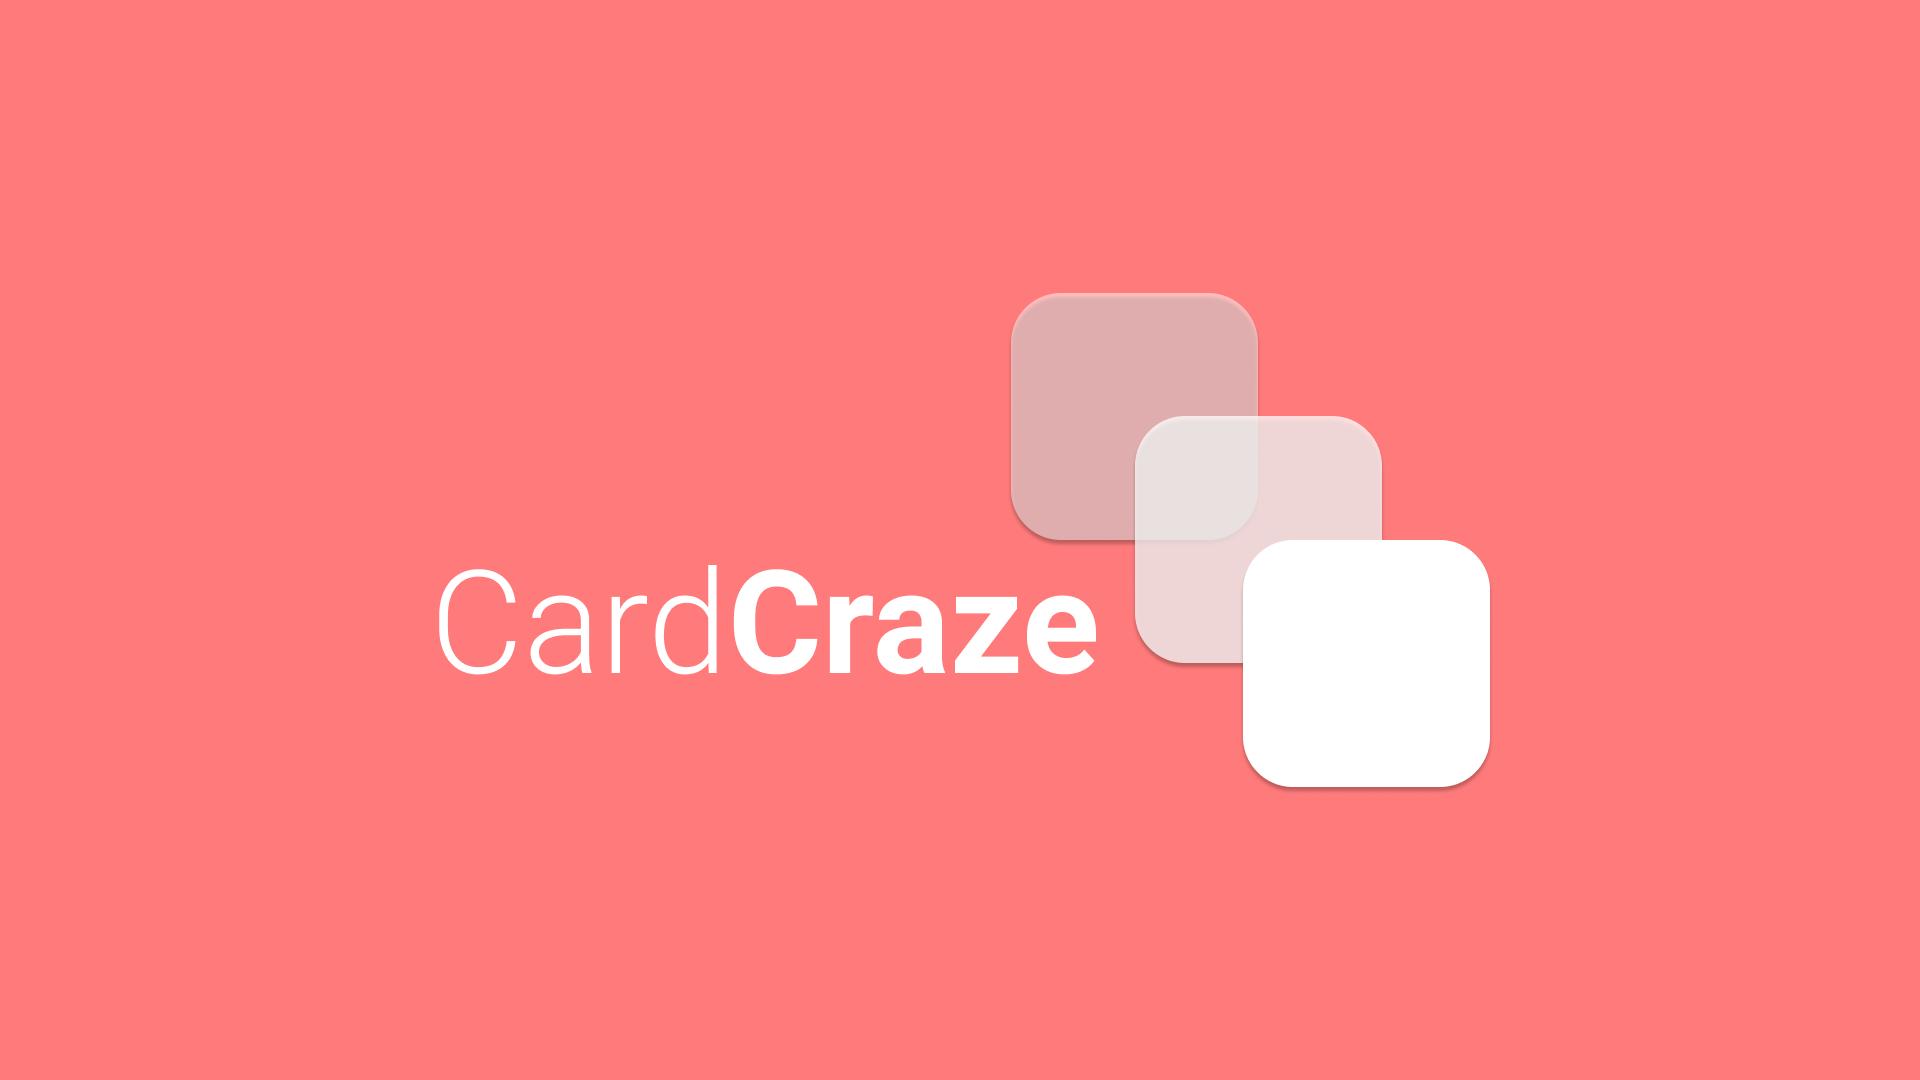 Card Craze